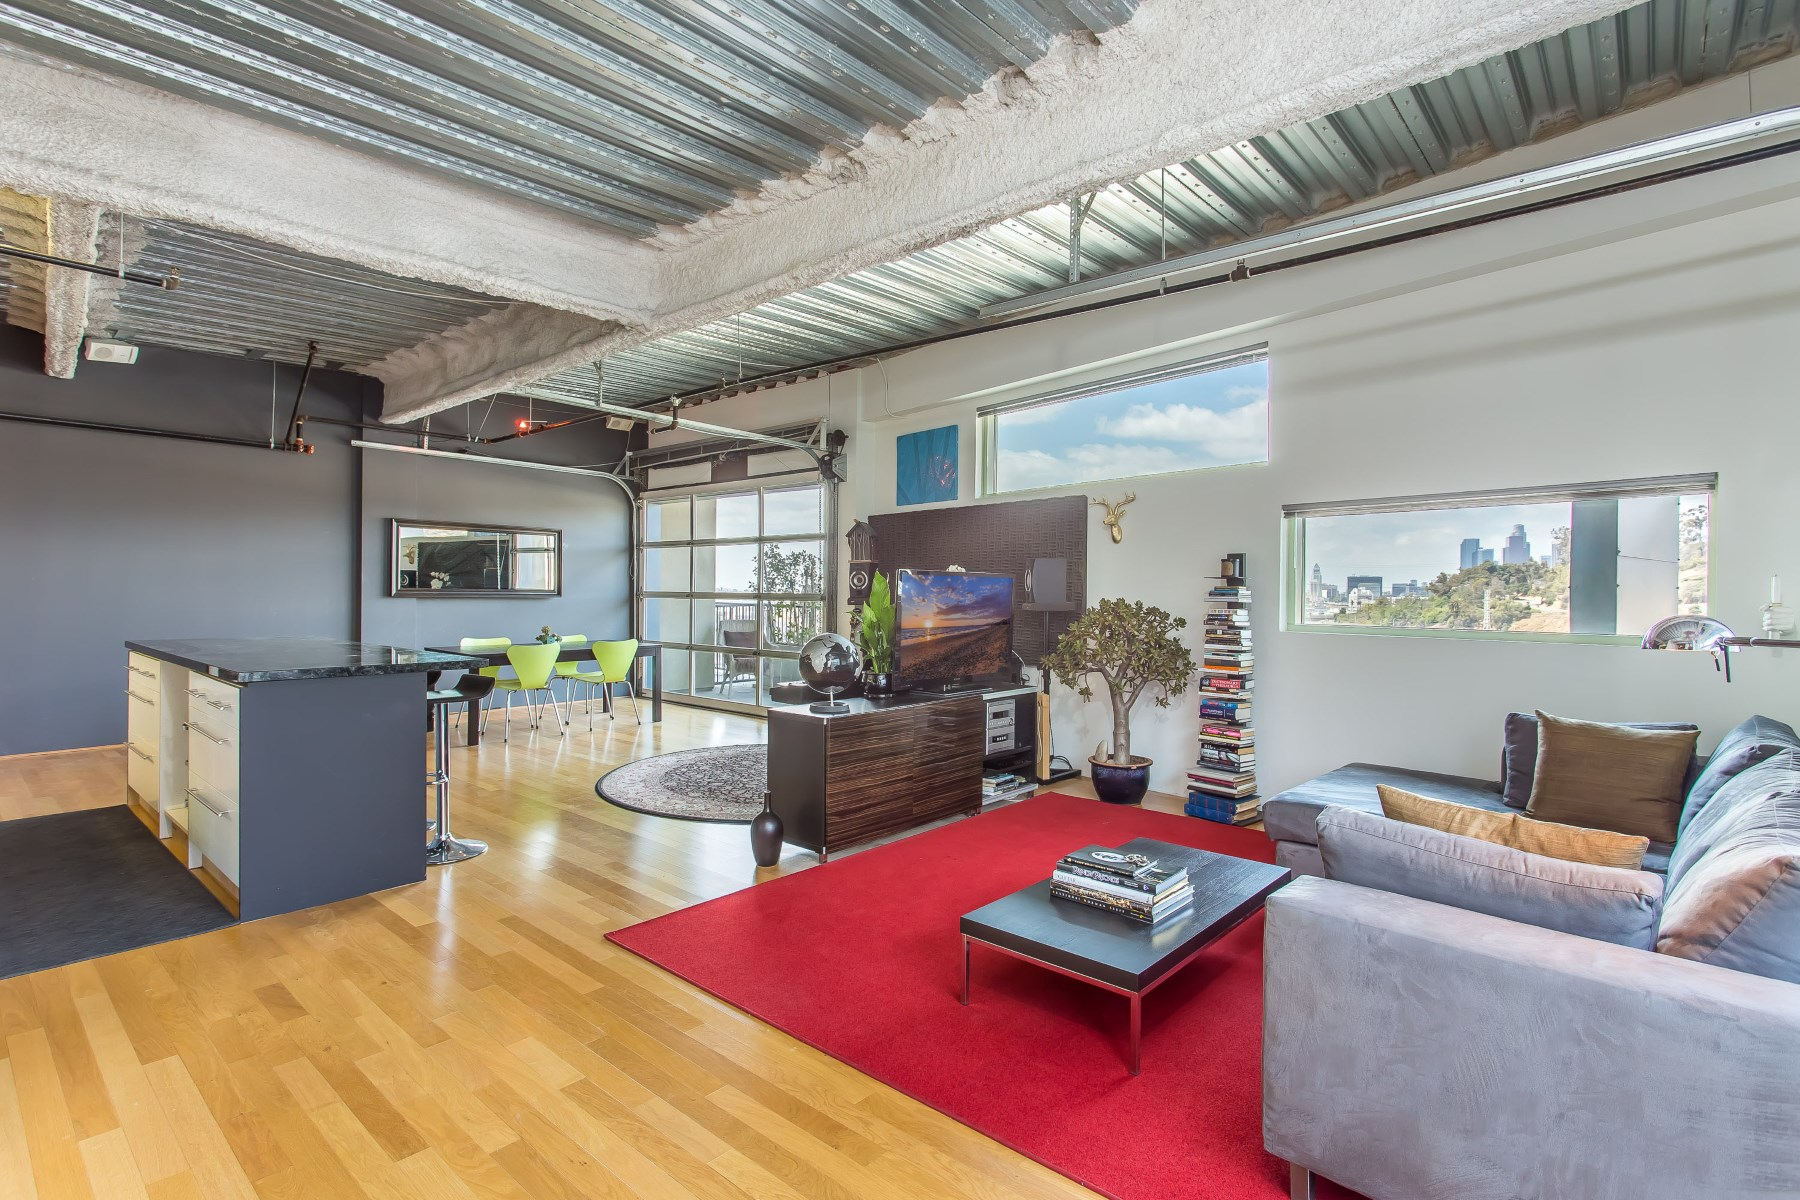 Condomínio para Venda às Modern Lincoln Heights Penthouse 200 N San Fernando Rd #612 Downtown Los Angeles, Los Angeles, Califórnia, 90031 Estados Unidos